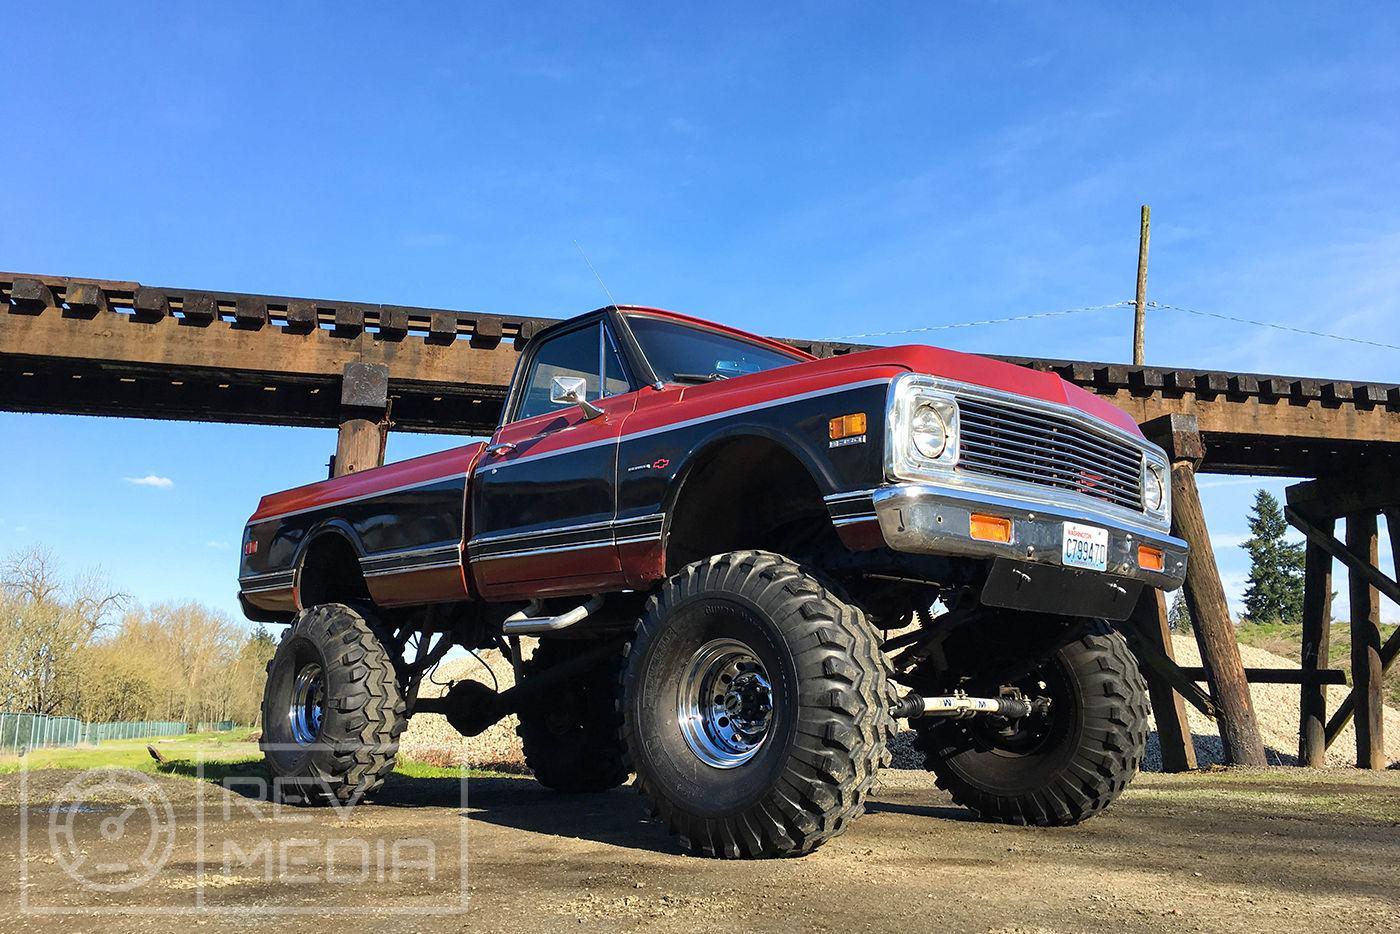 Lifted Beast 1971 Chevrolet C 10 Monster Truck For Sale